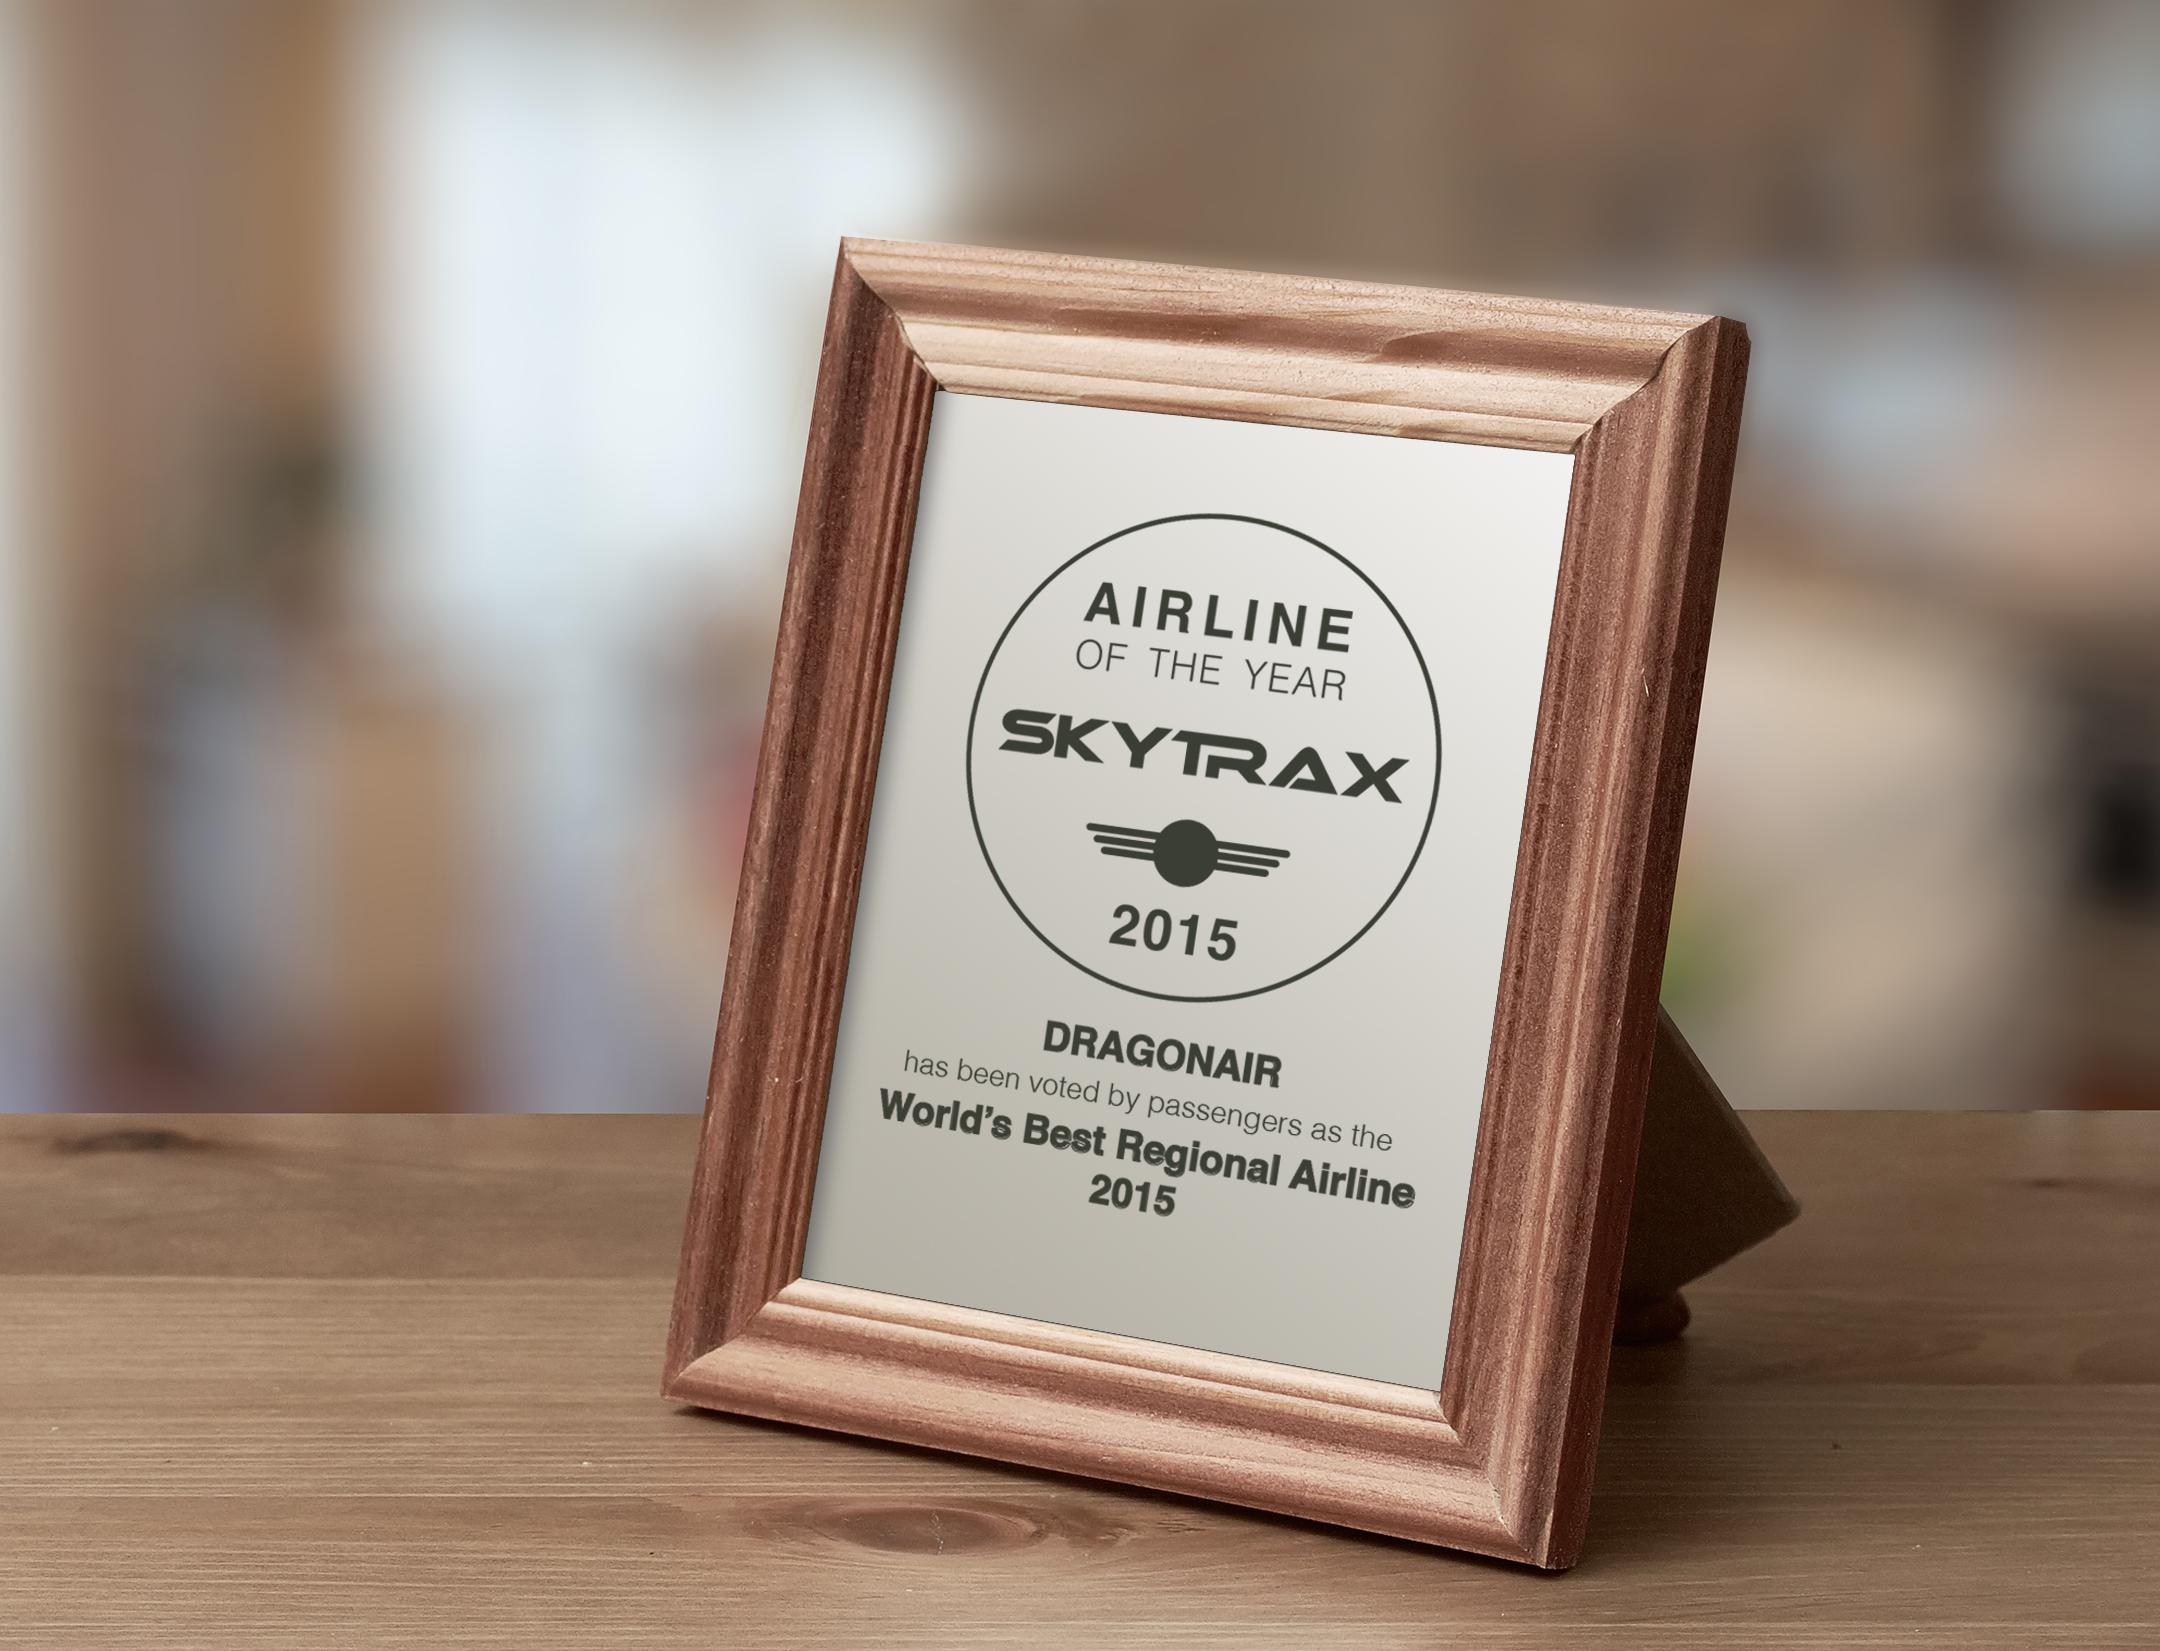 Skytrax Frame.jpg